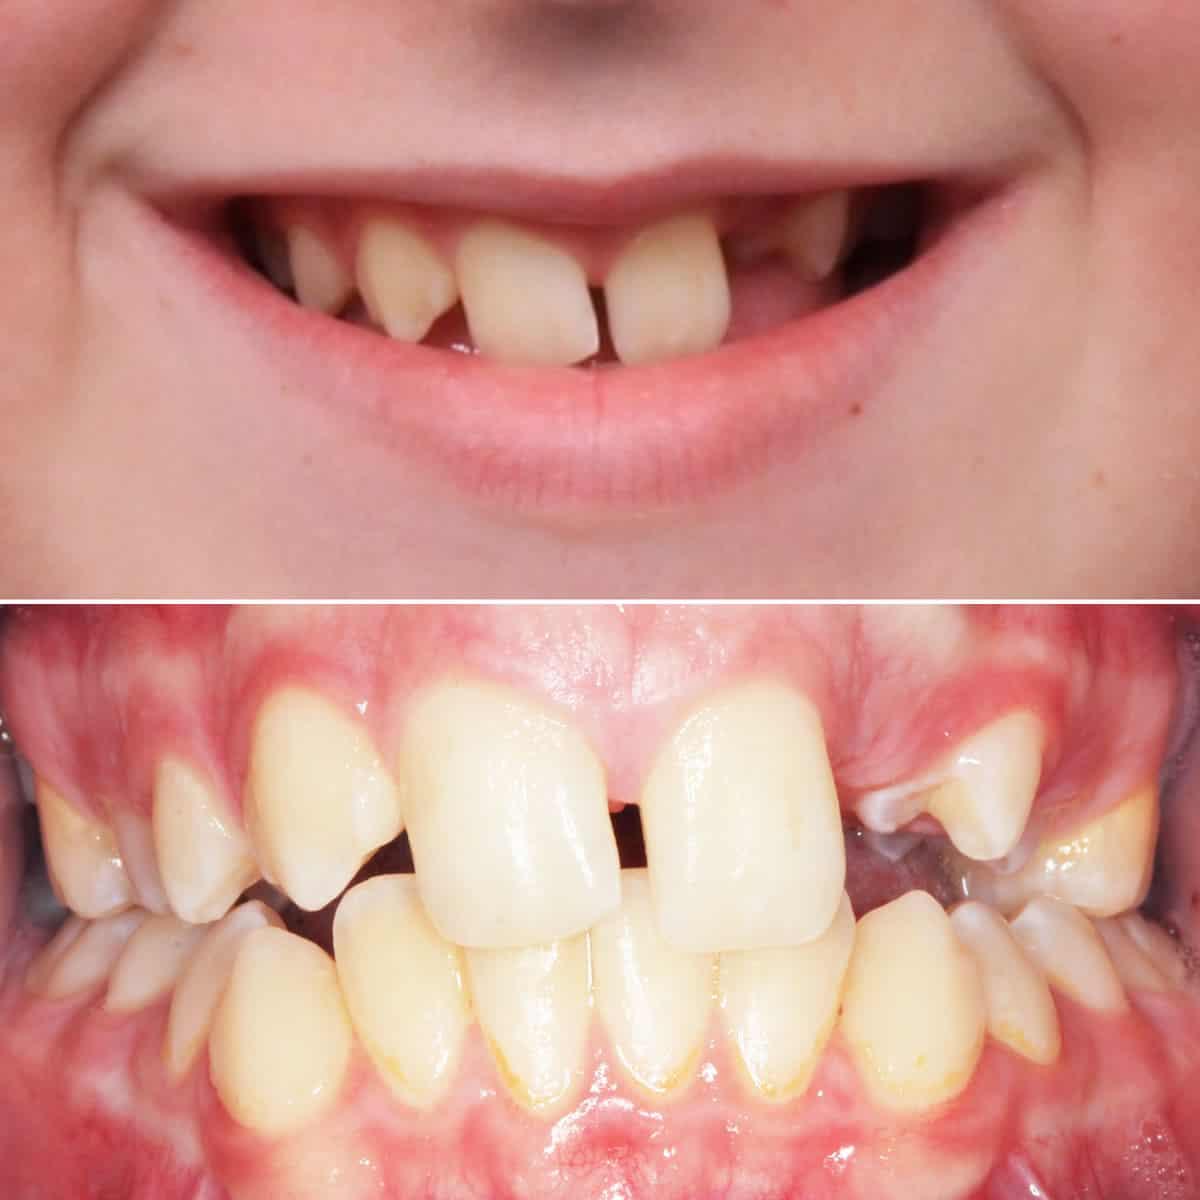 Before orthodontic treatment 01